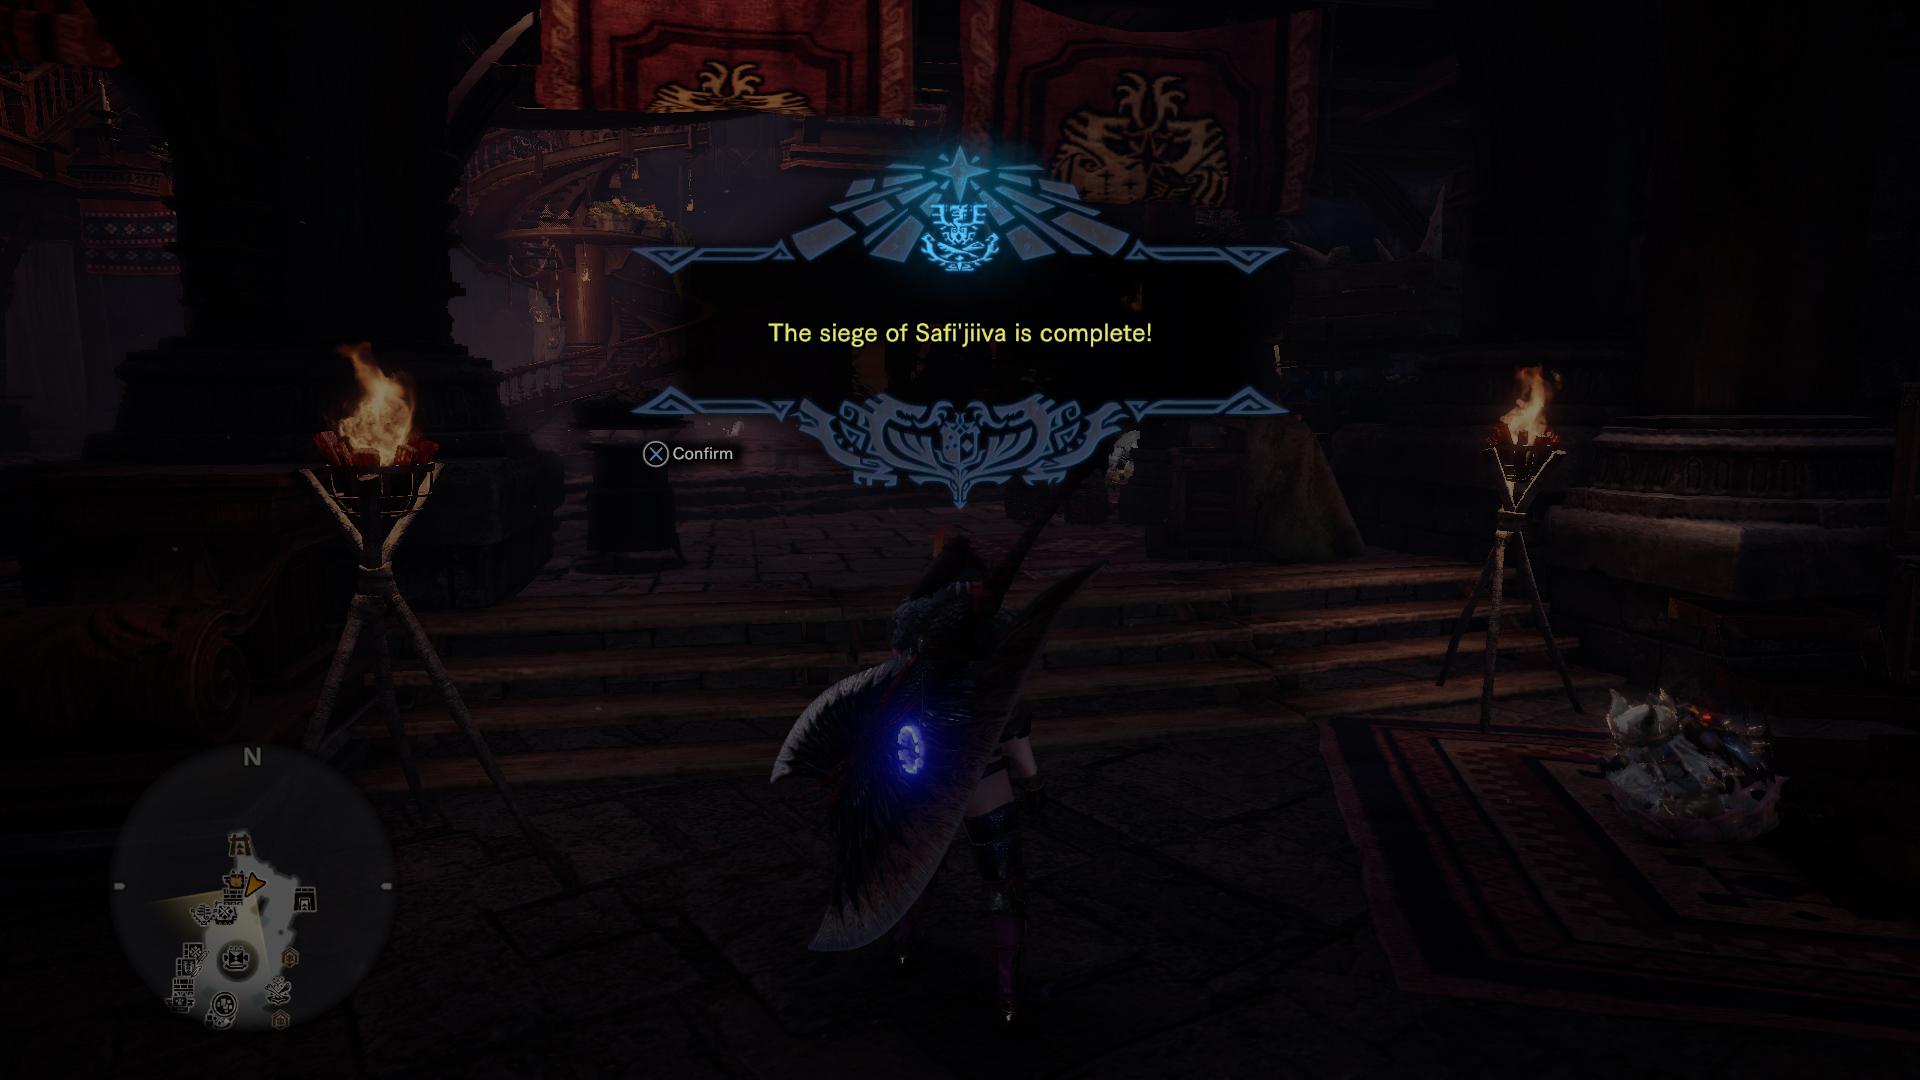 Monster Hunter World Iceborne Safi Jiiva Siege Guide Godisageek Com